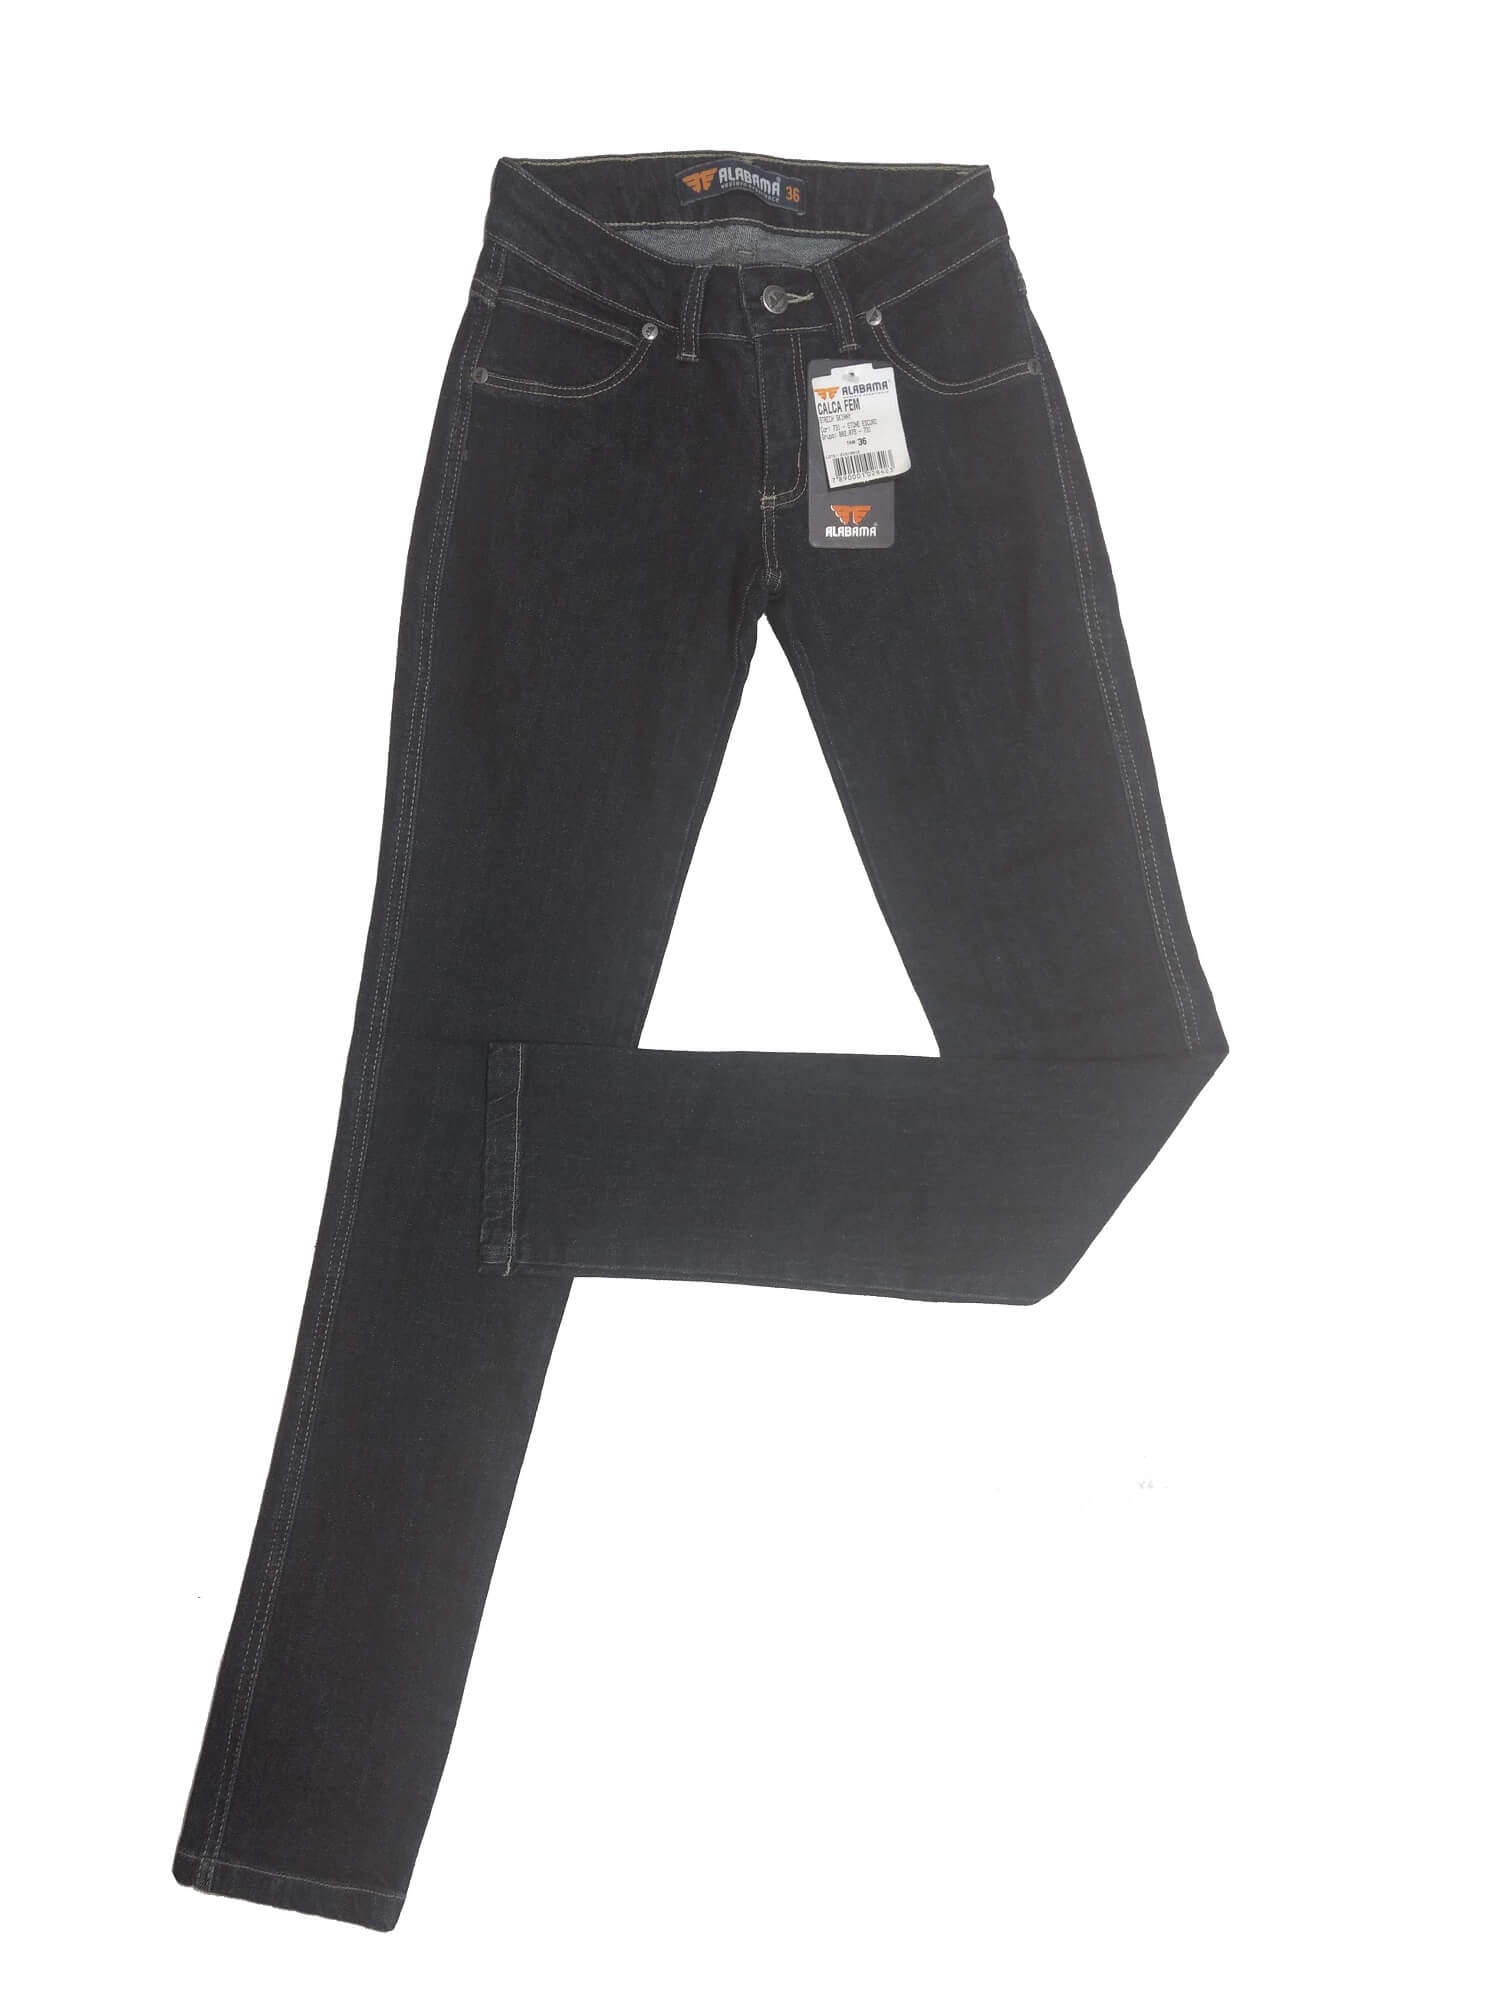 Calça Feminina Alabama Stretch Ref. 802.079.731